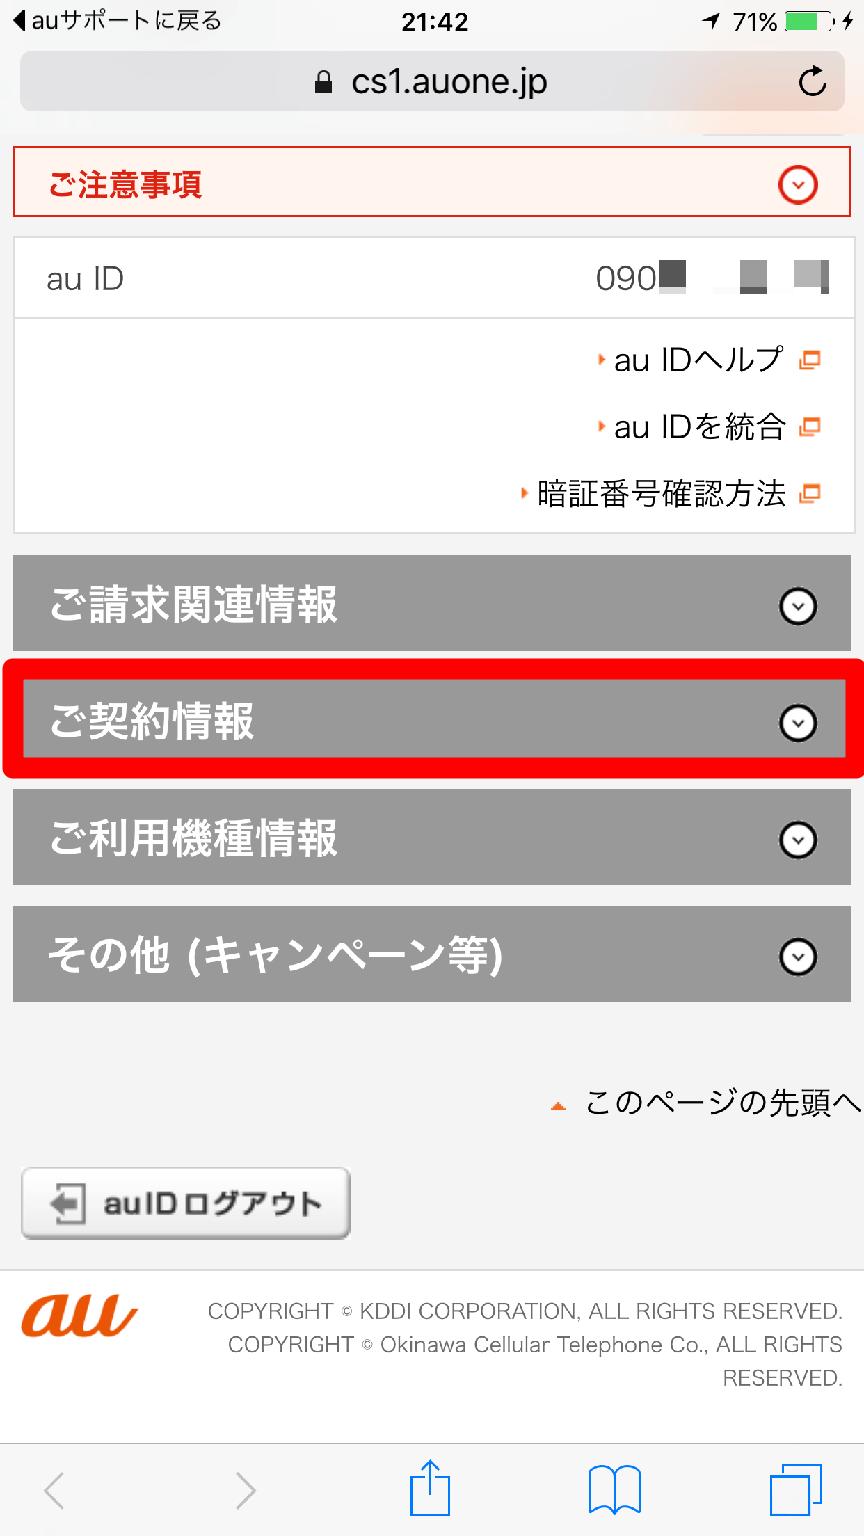 契約情報の確認画面